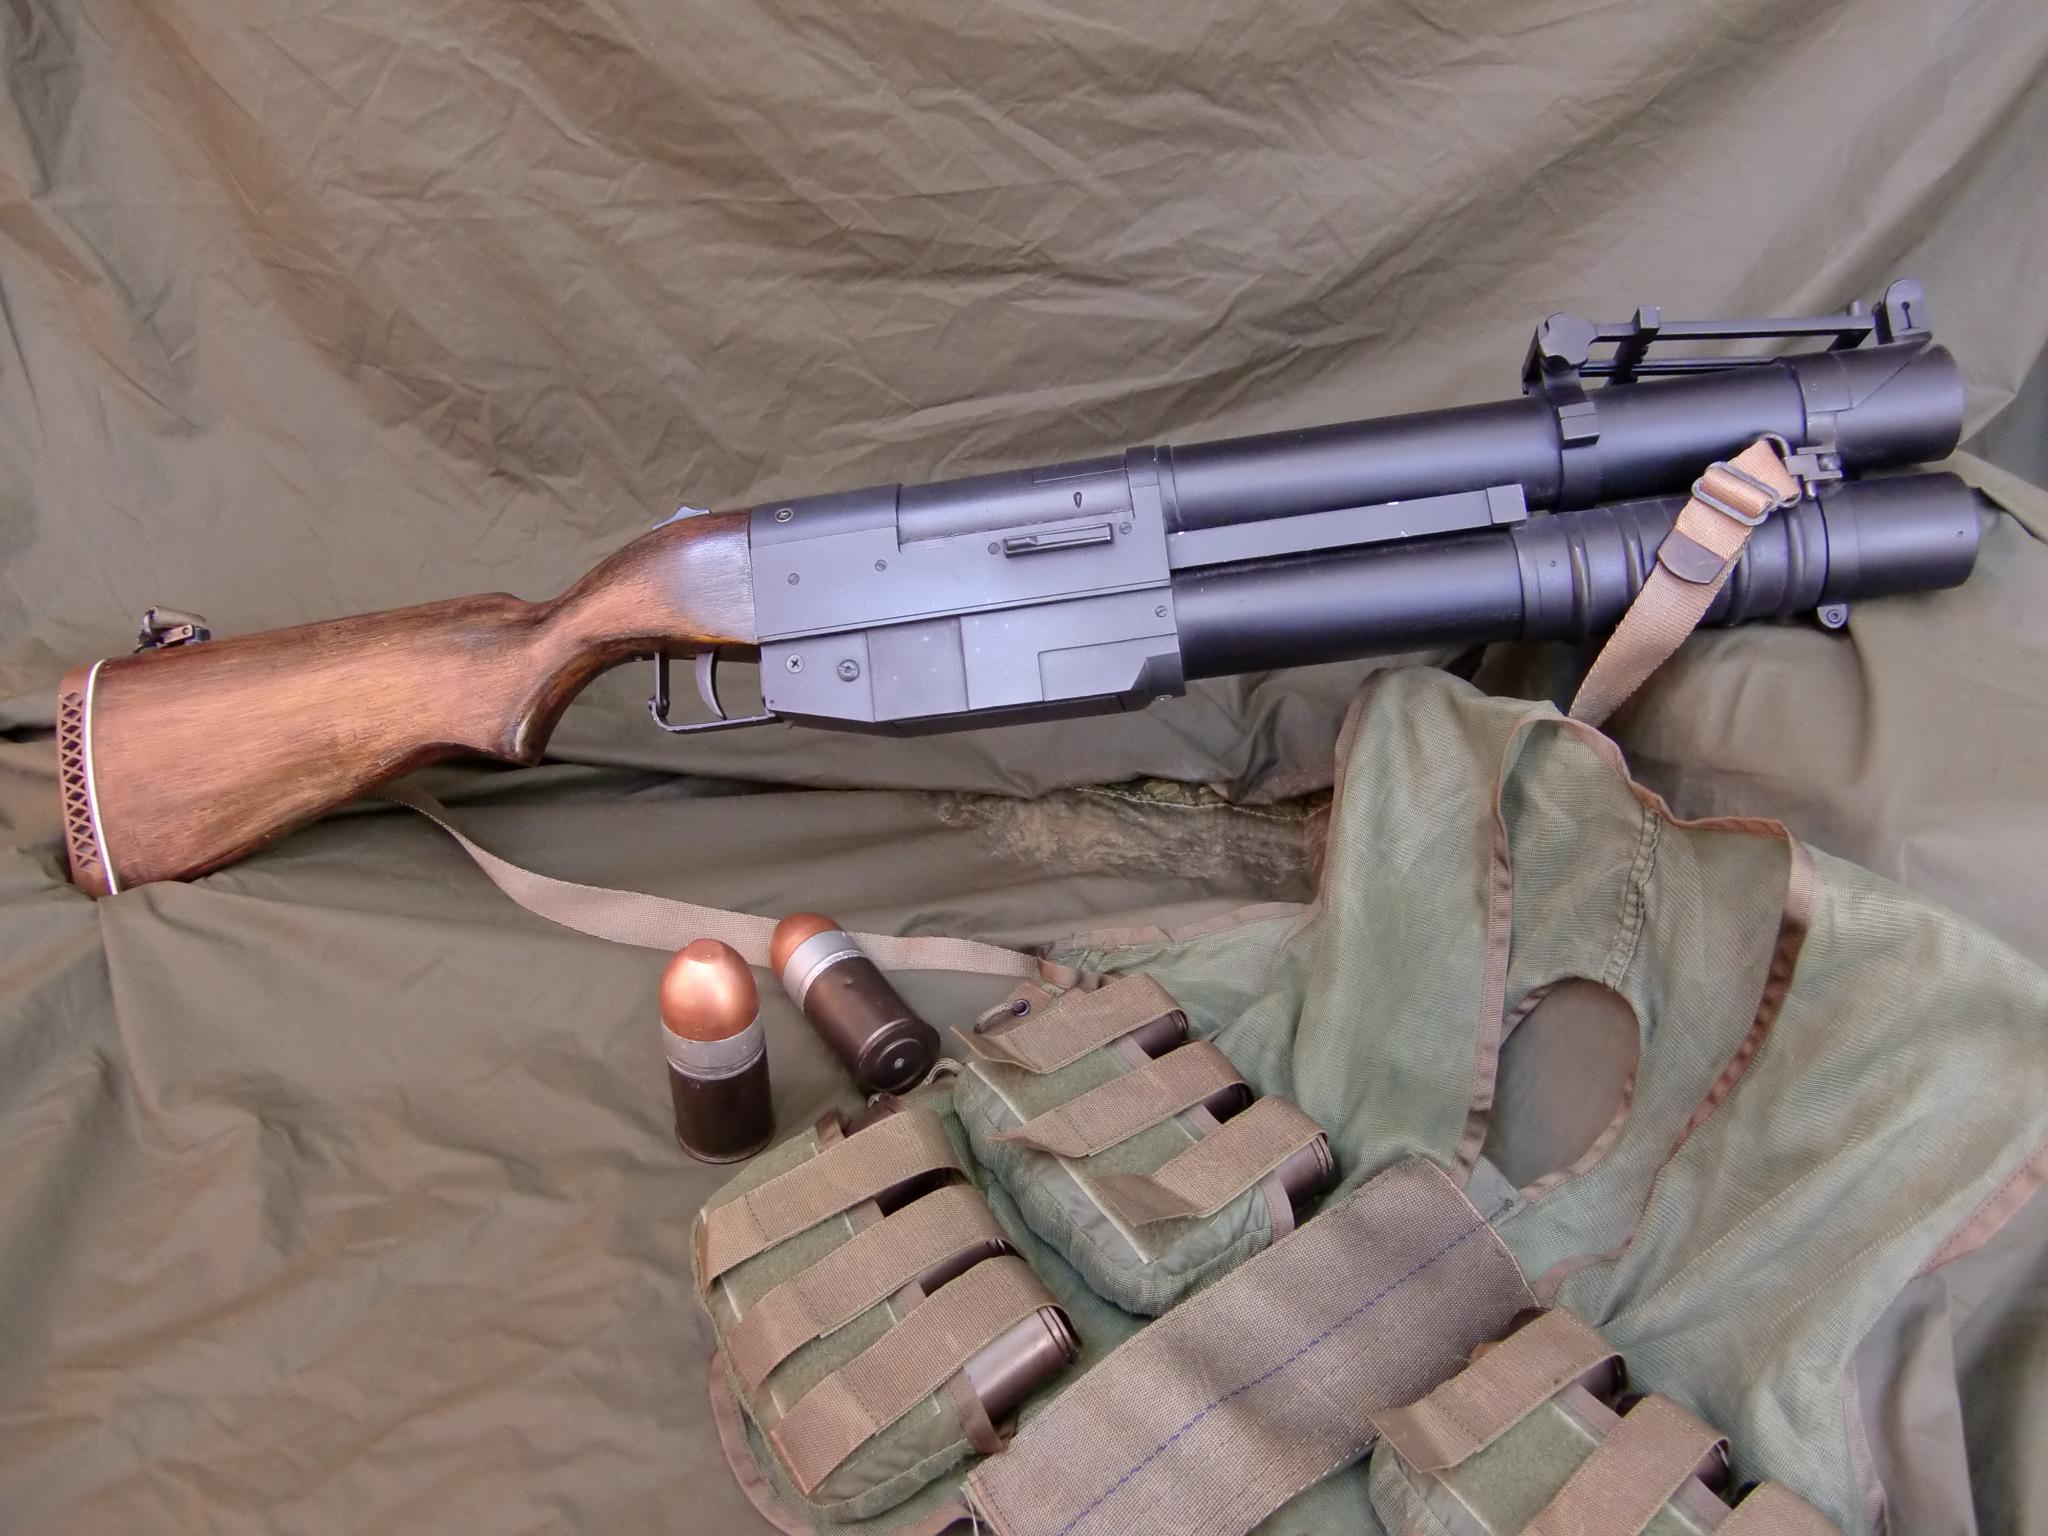 37mm Launcher Question - AR15 COM